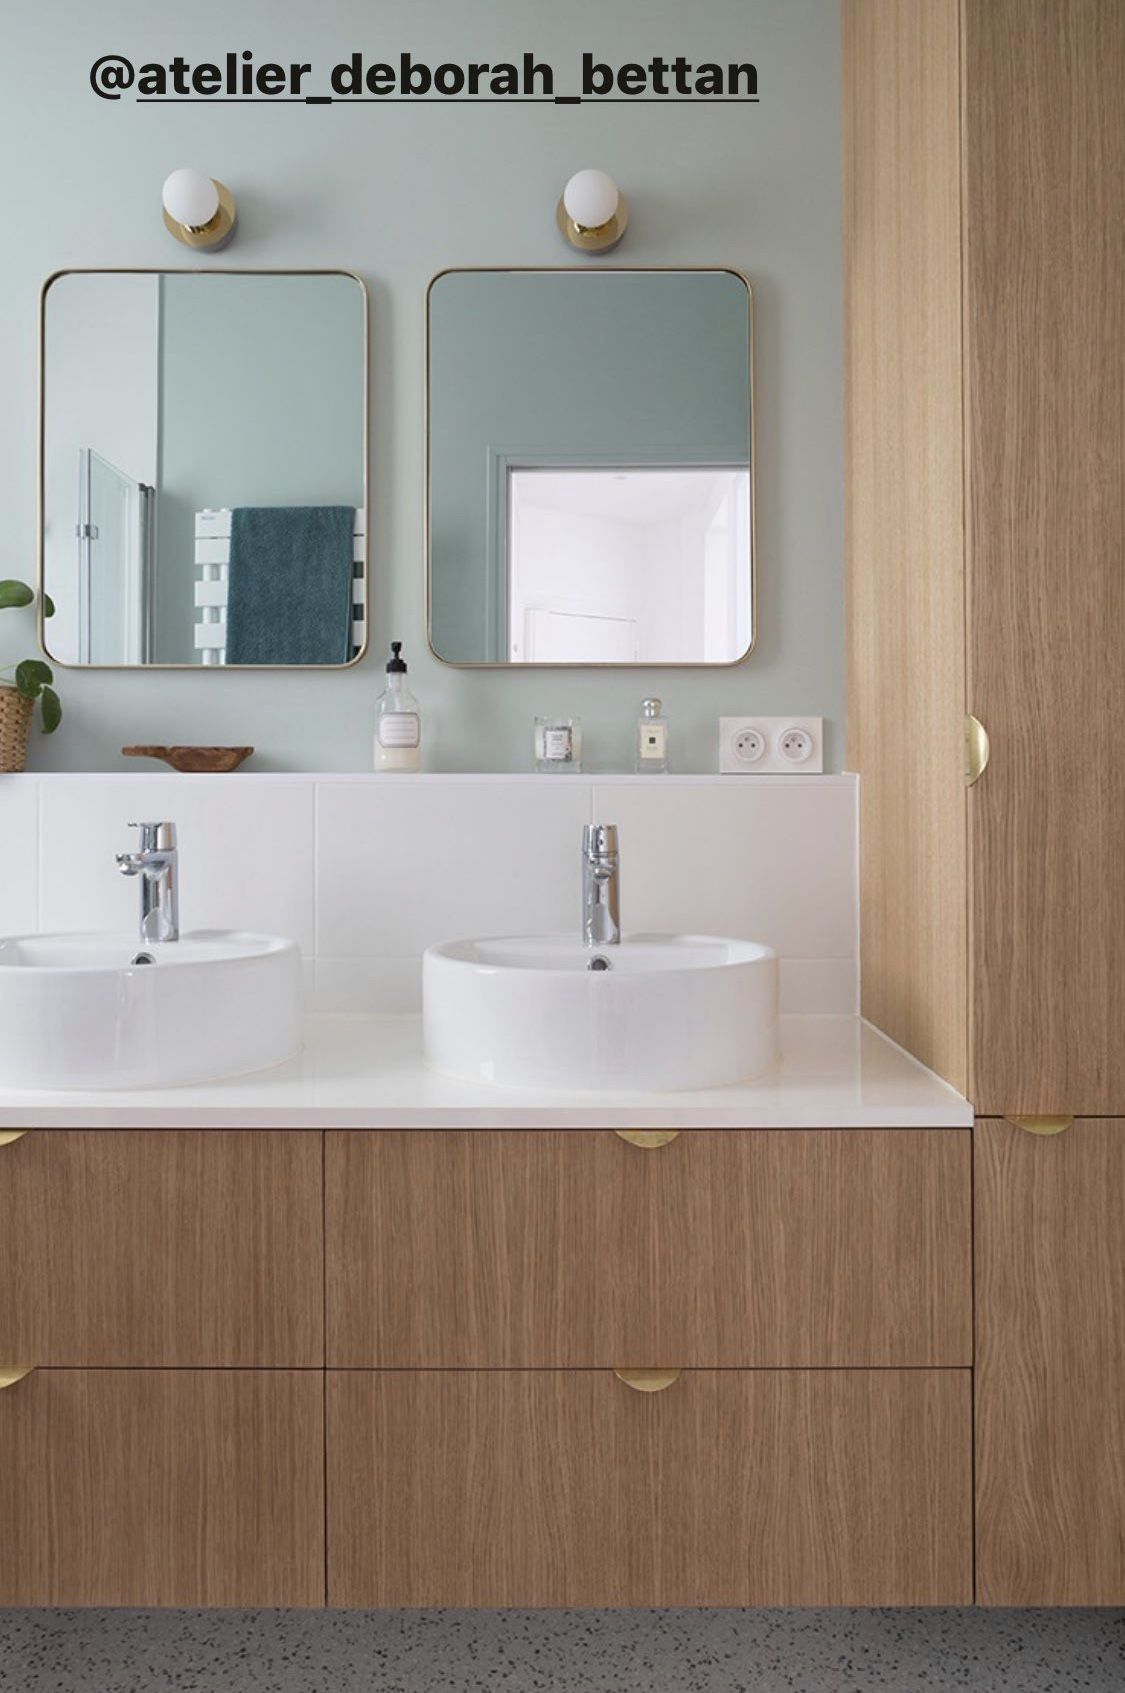 Epingle Par Lo Vincent Sur Bathroom En 2020 Meuble De Cuisine Ikea Meuble Salle De Bain Ikea Salle De Bain